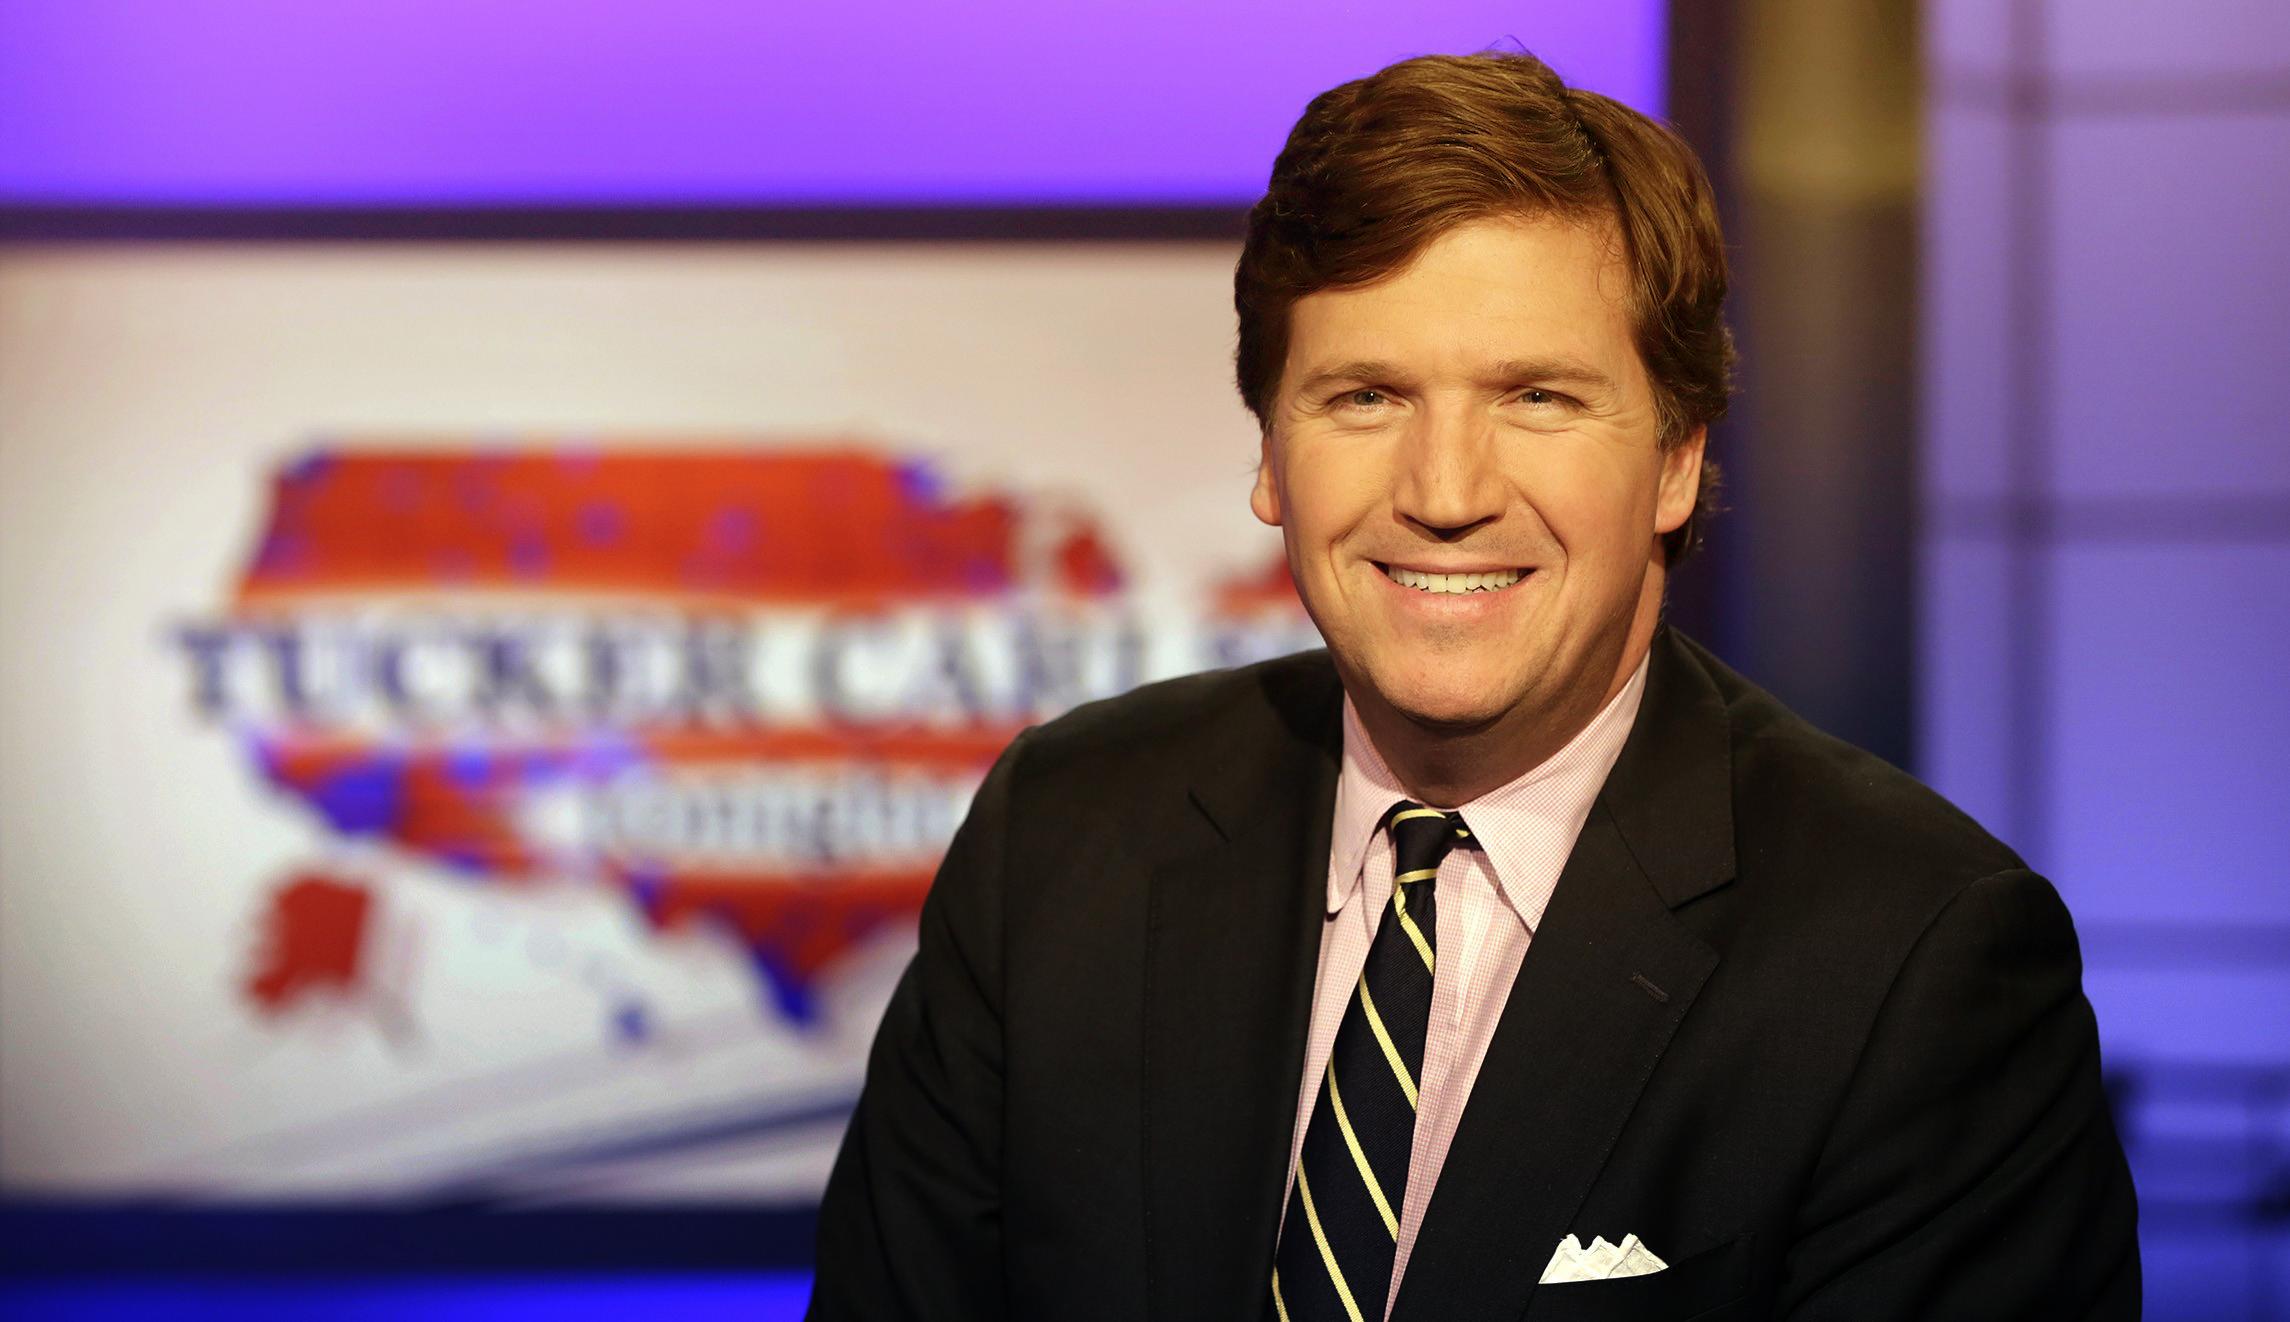 Tucker Carlson |  Fox News